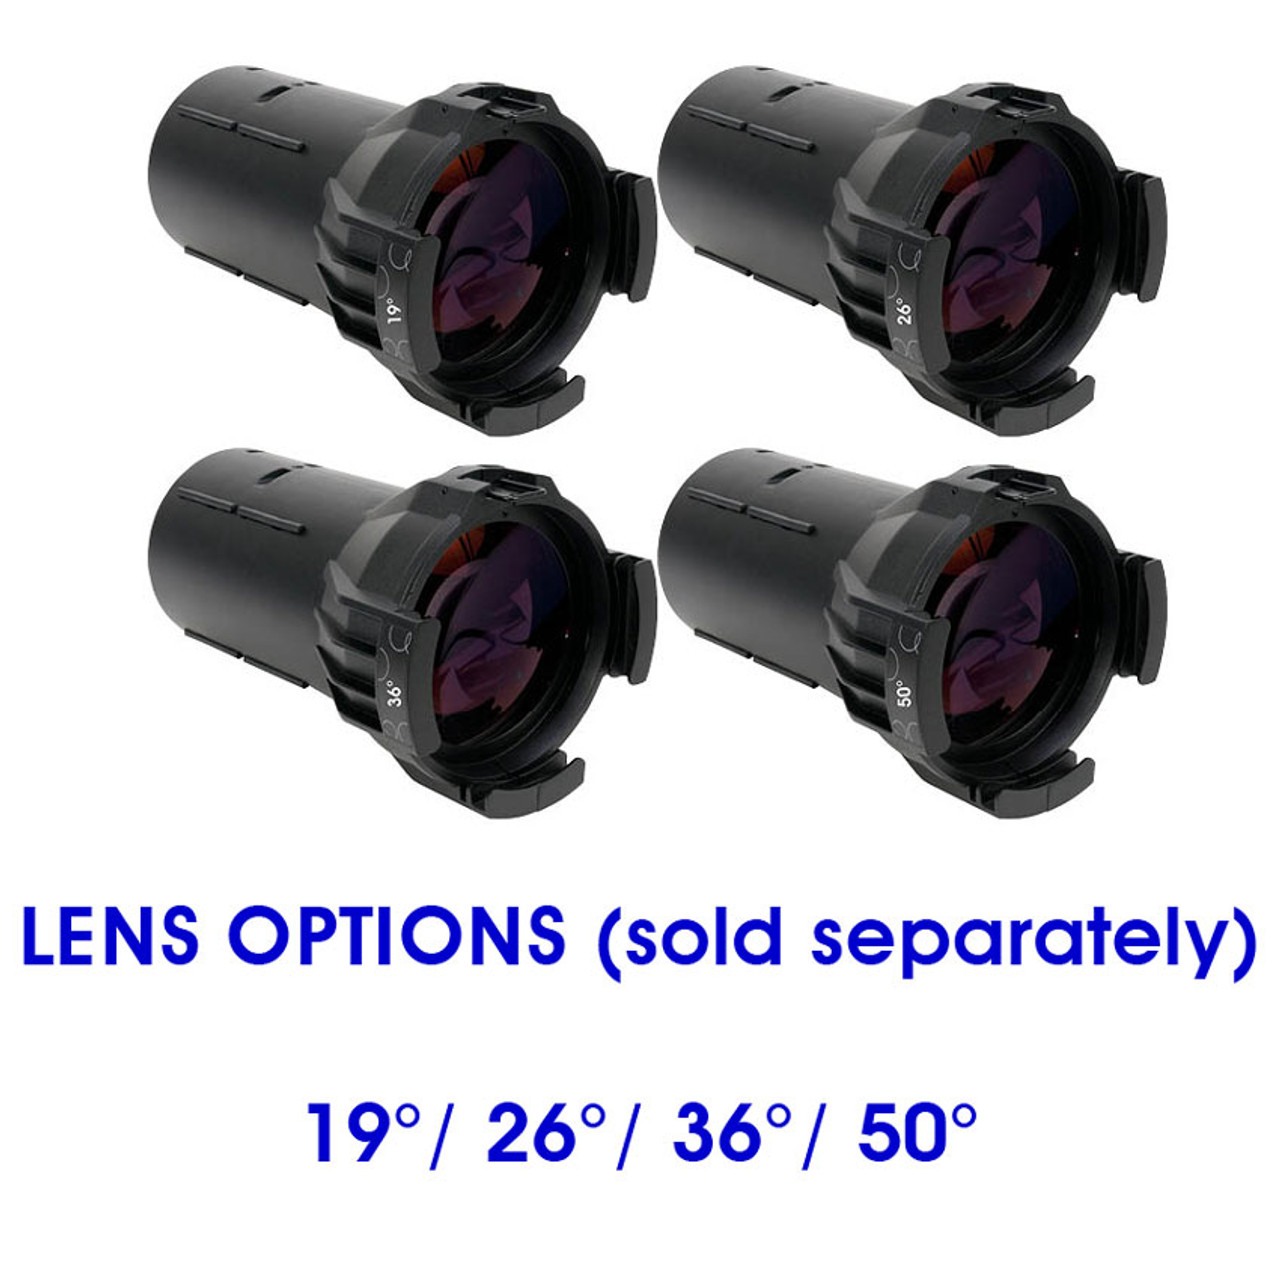 Elation 26 Degree Lens